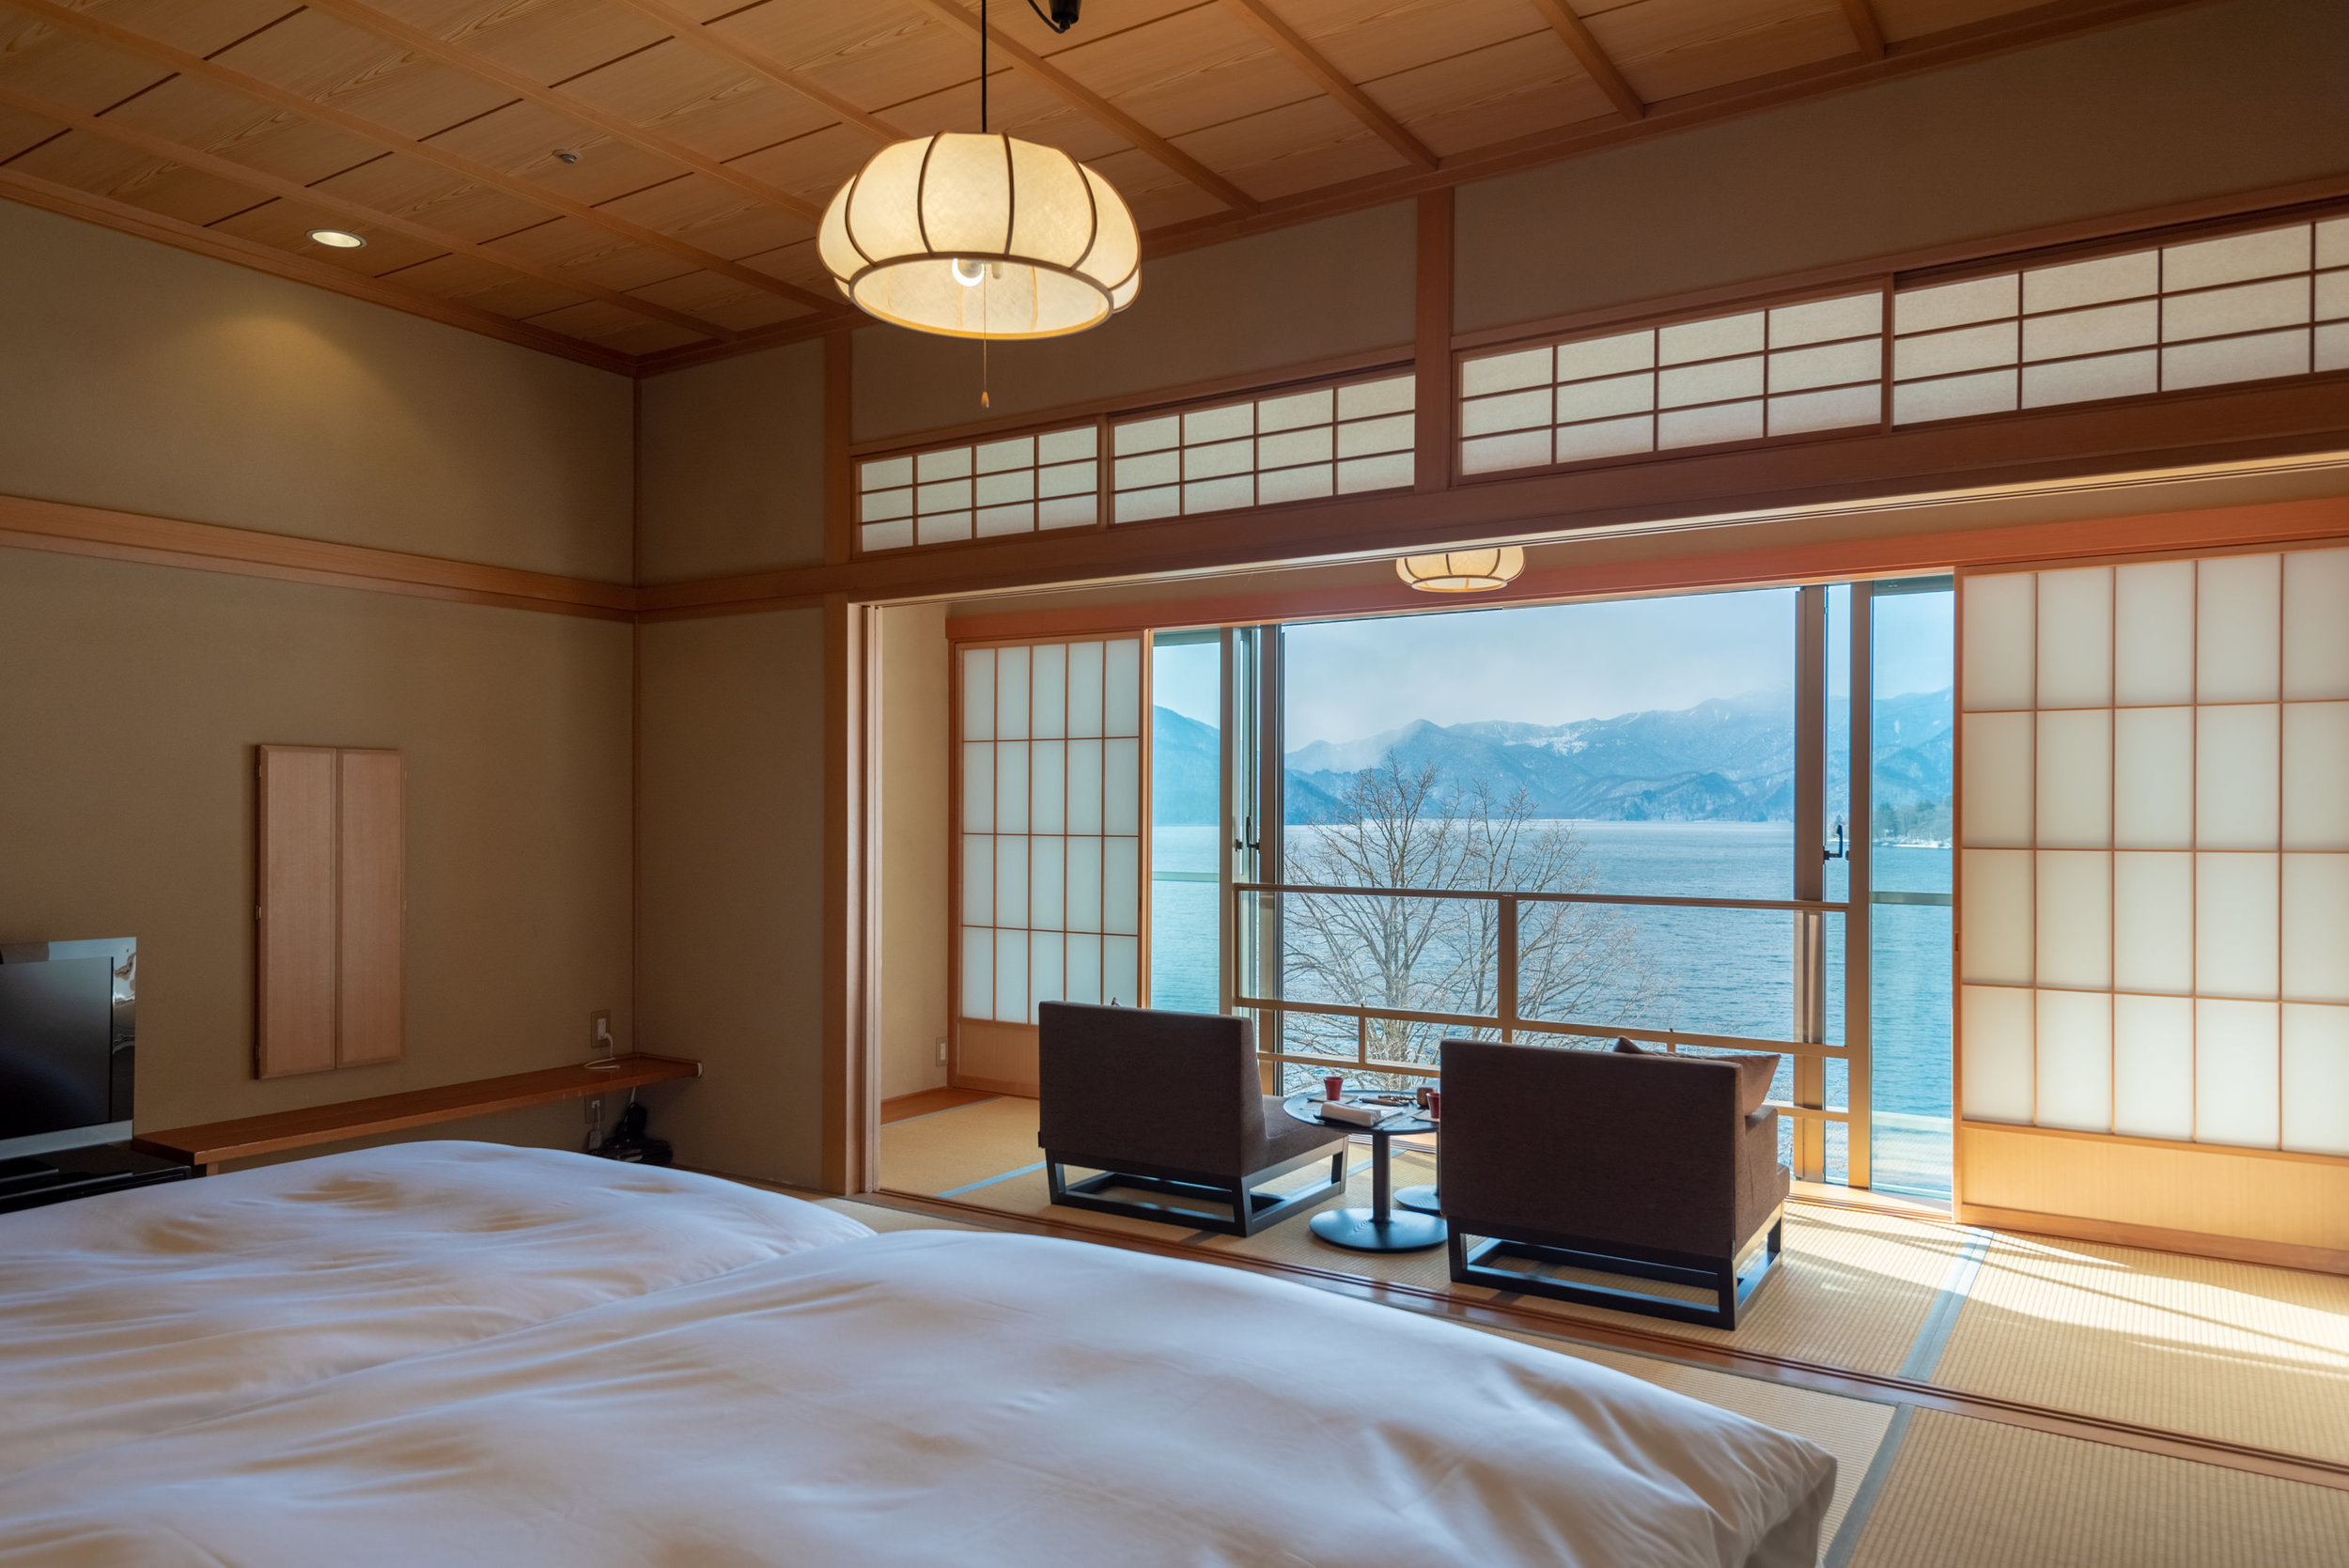 Unobstructed View of Lake Chuzenji  Japanese-style Room with Lake View GL2 - Hoshino Resorts KAI Nikko